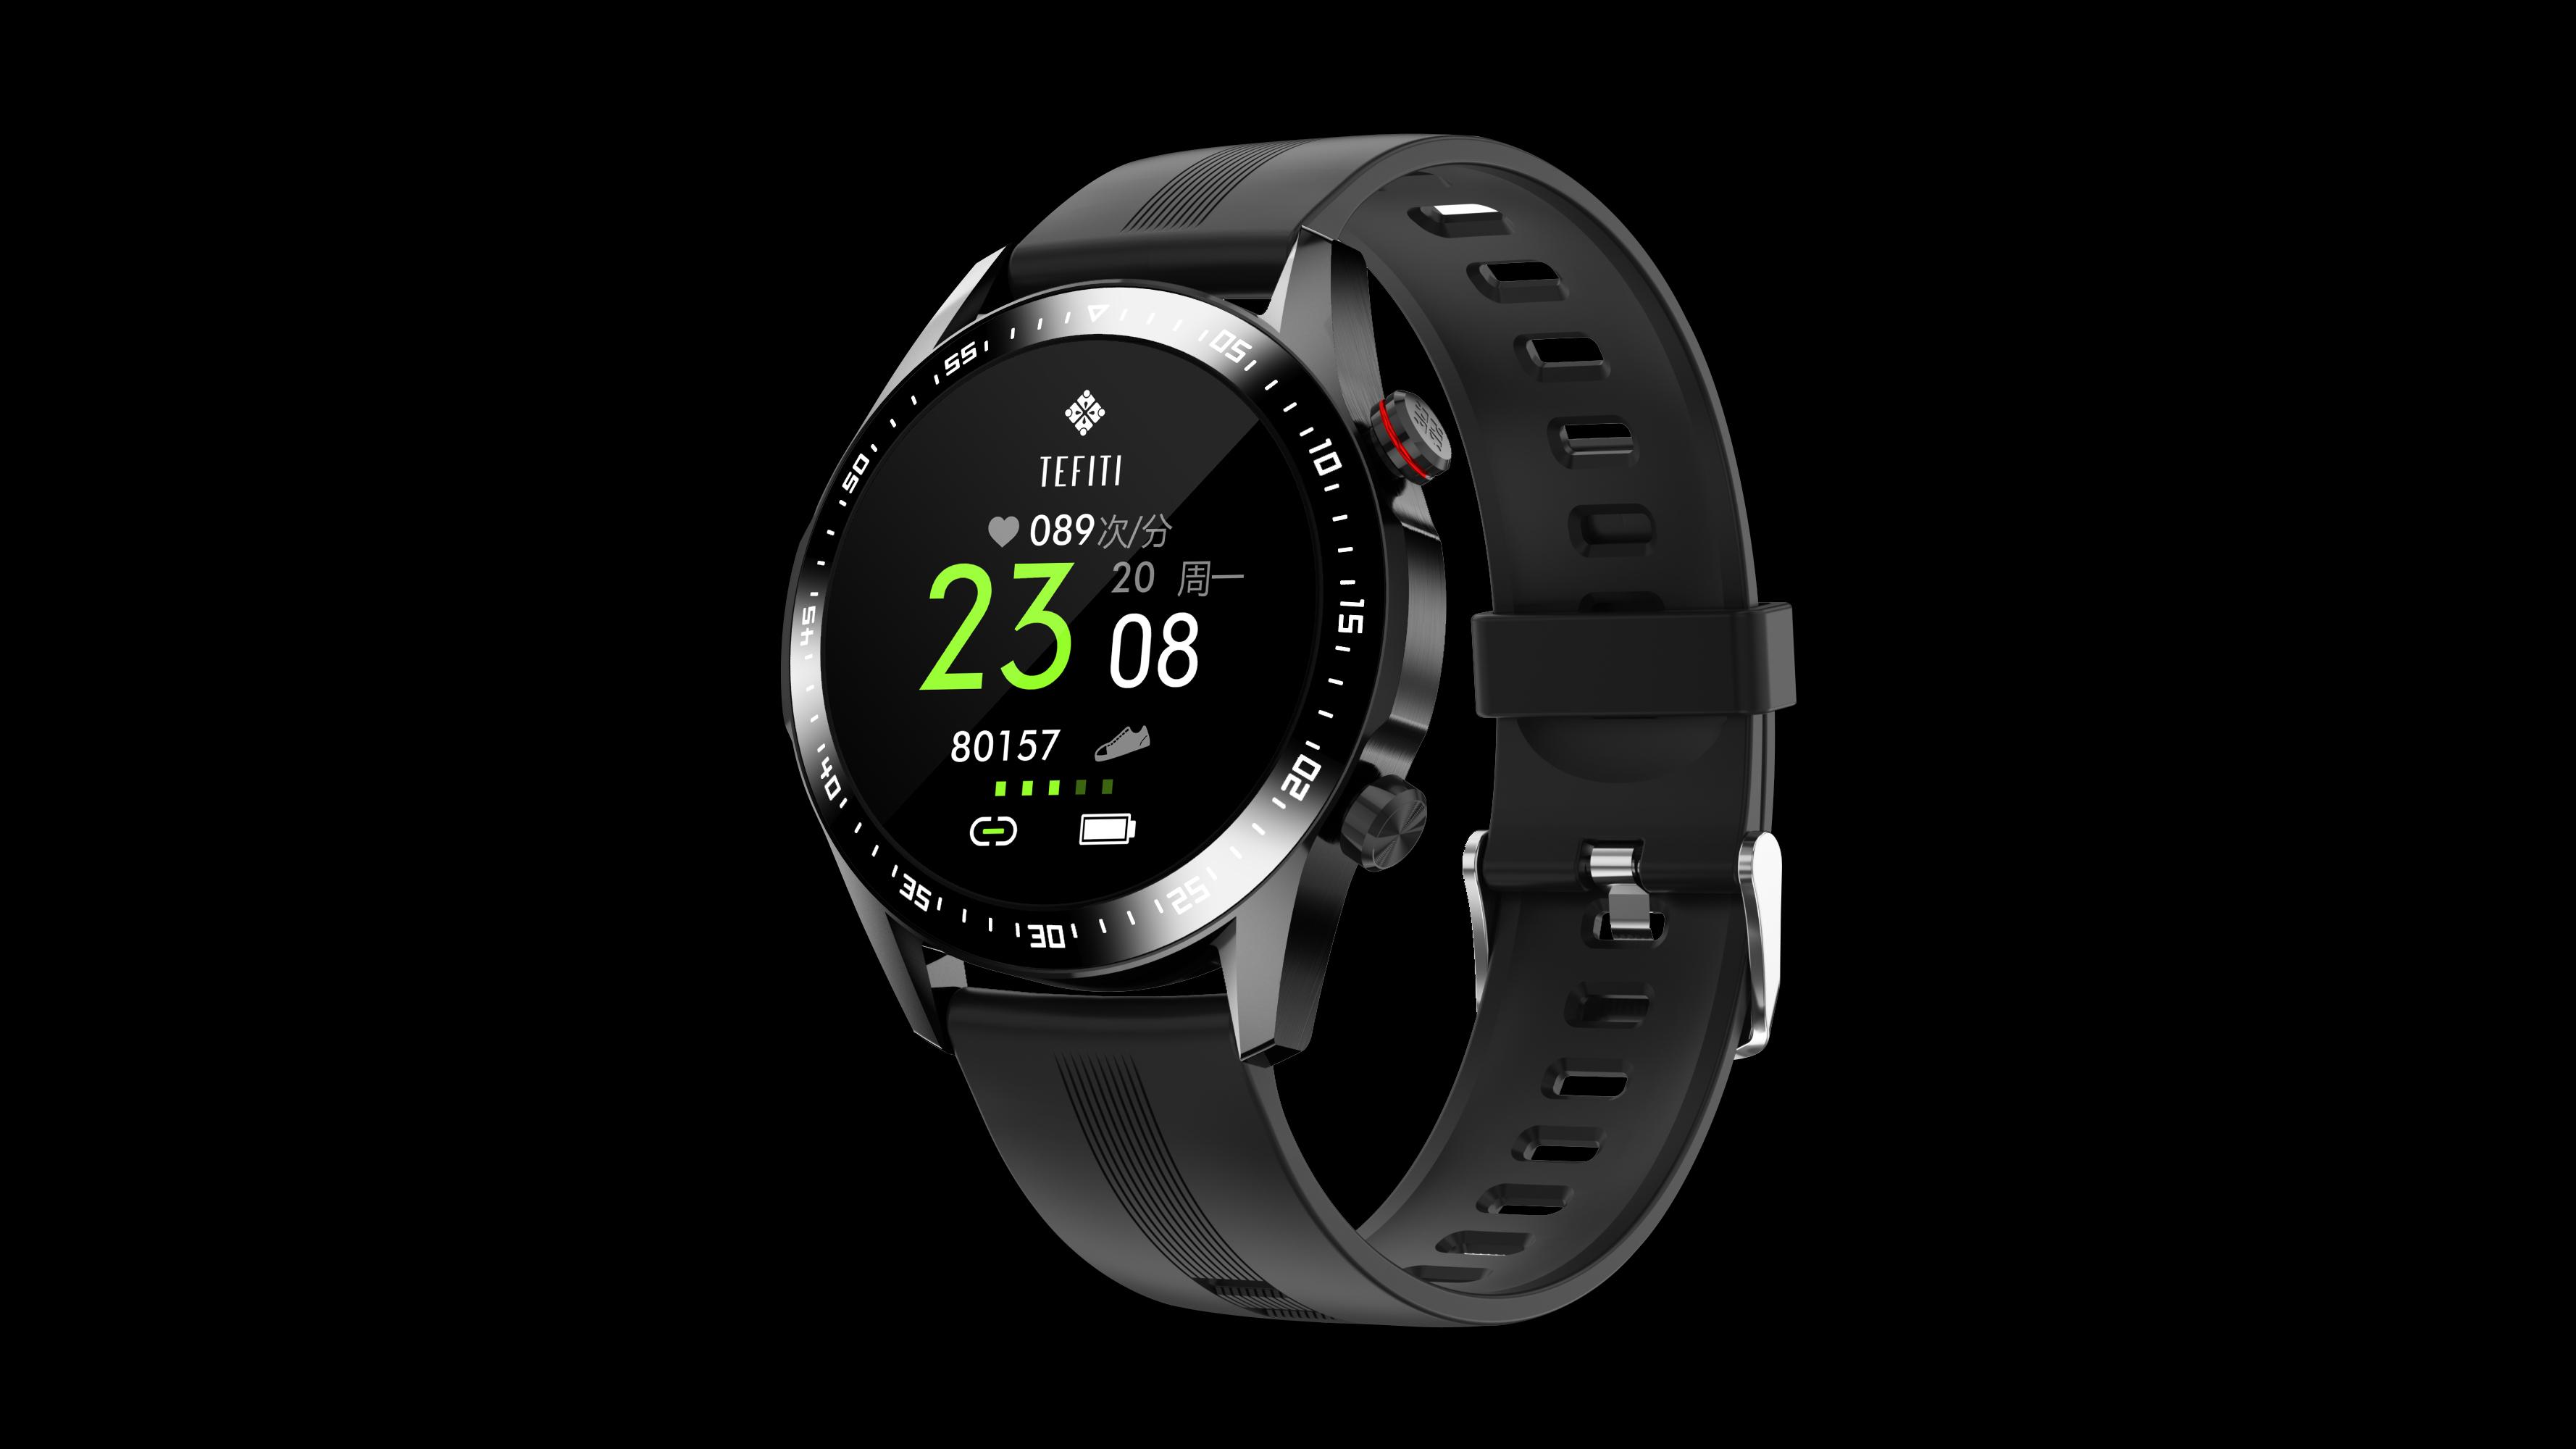 Leather Round Screen BP Smart Watches Men Wrist Smartwatch BT Call Music Phone watches Business Smart Watch